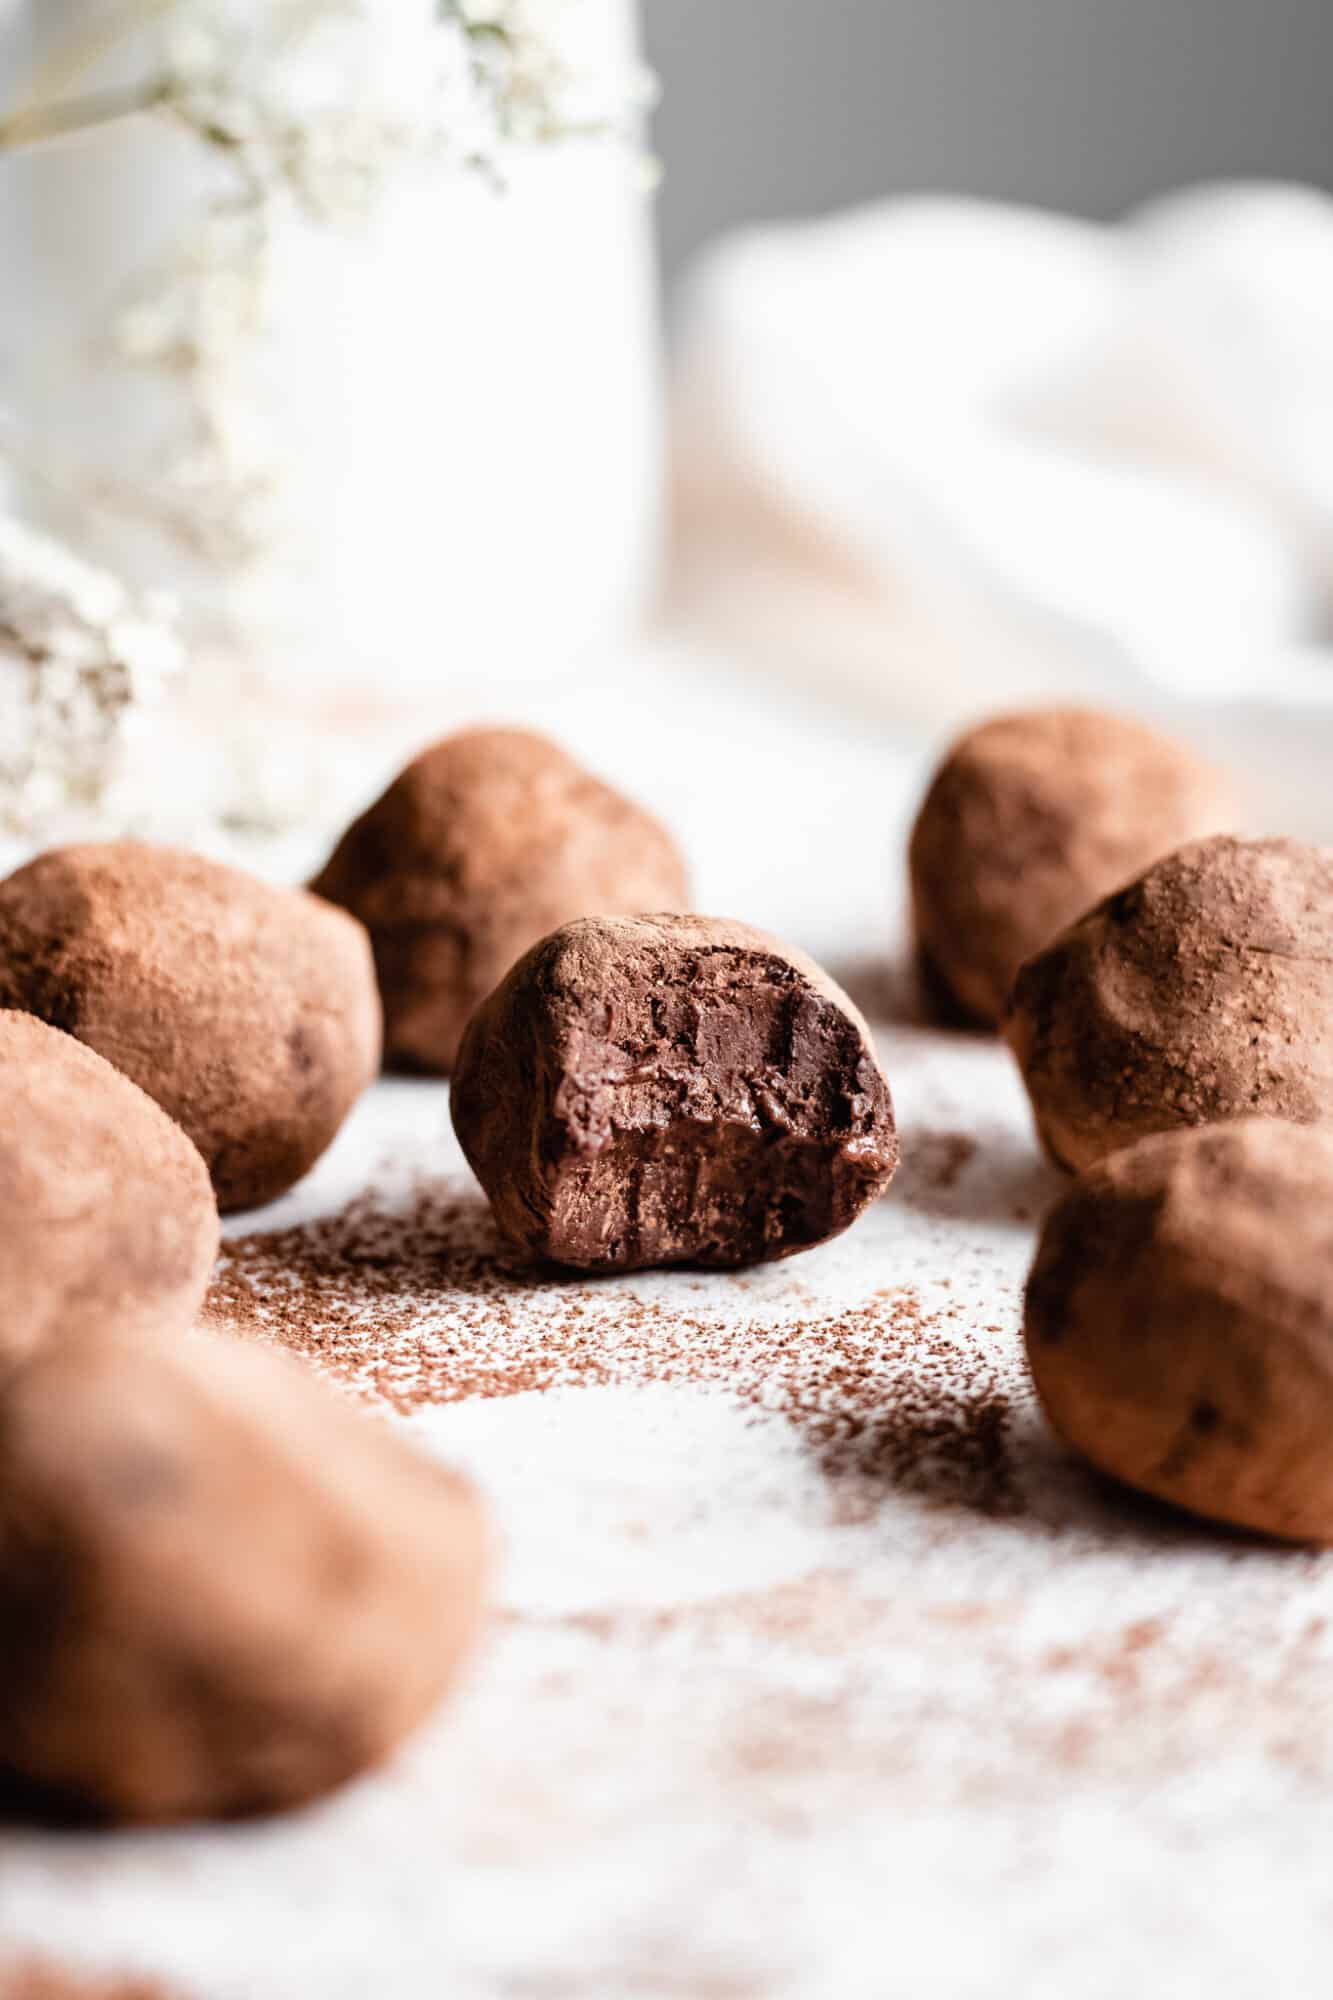 vegan chocolate truffles on wooden board